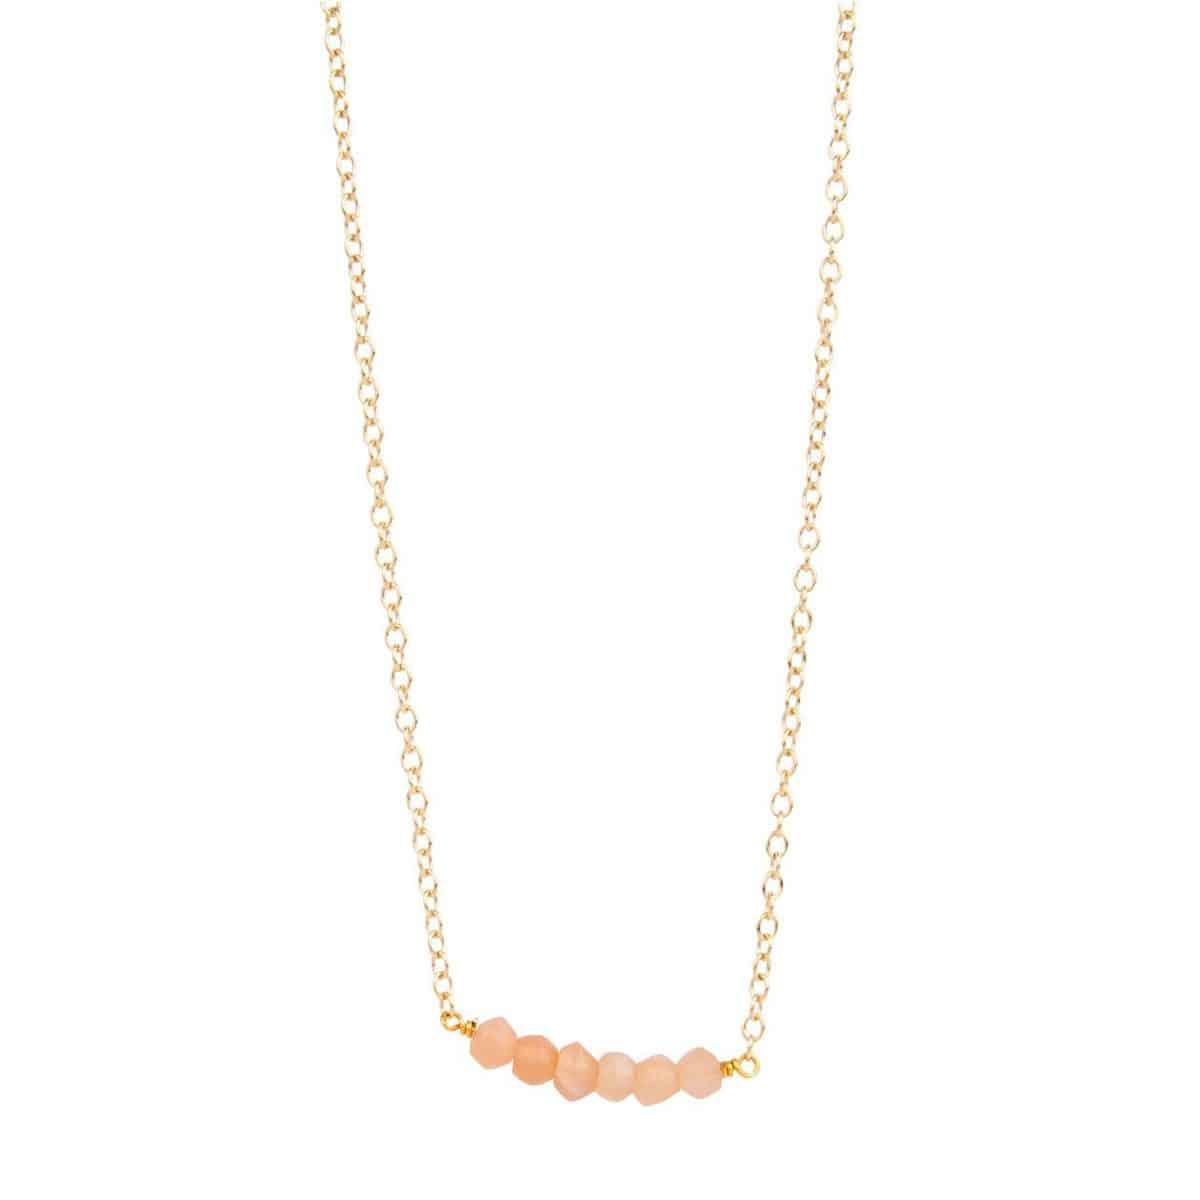 FabFitFun Summer 2017 VIP Box Spoilers - Kris Nations Mystic Bar Necklace